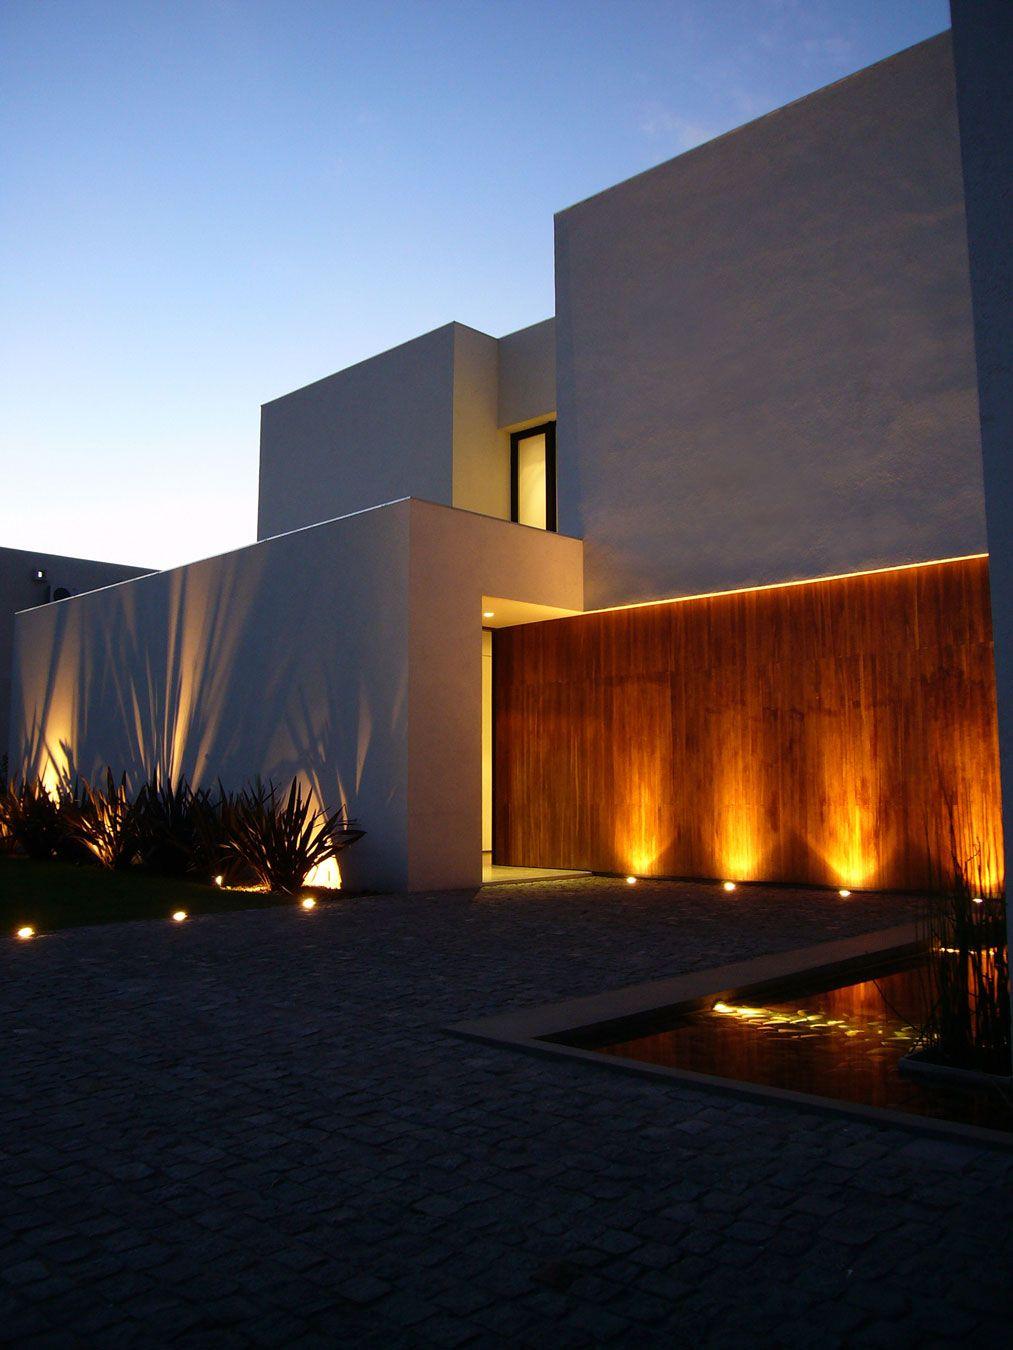 Casa BR by KLM Arquitectos Arquitectura Iluminacin de fach